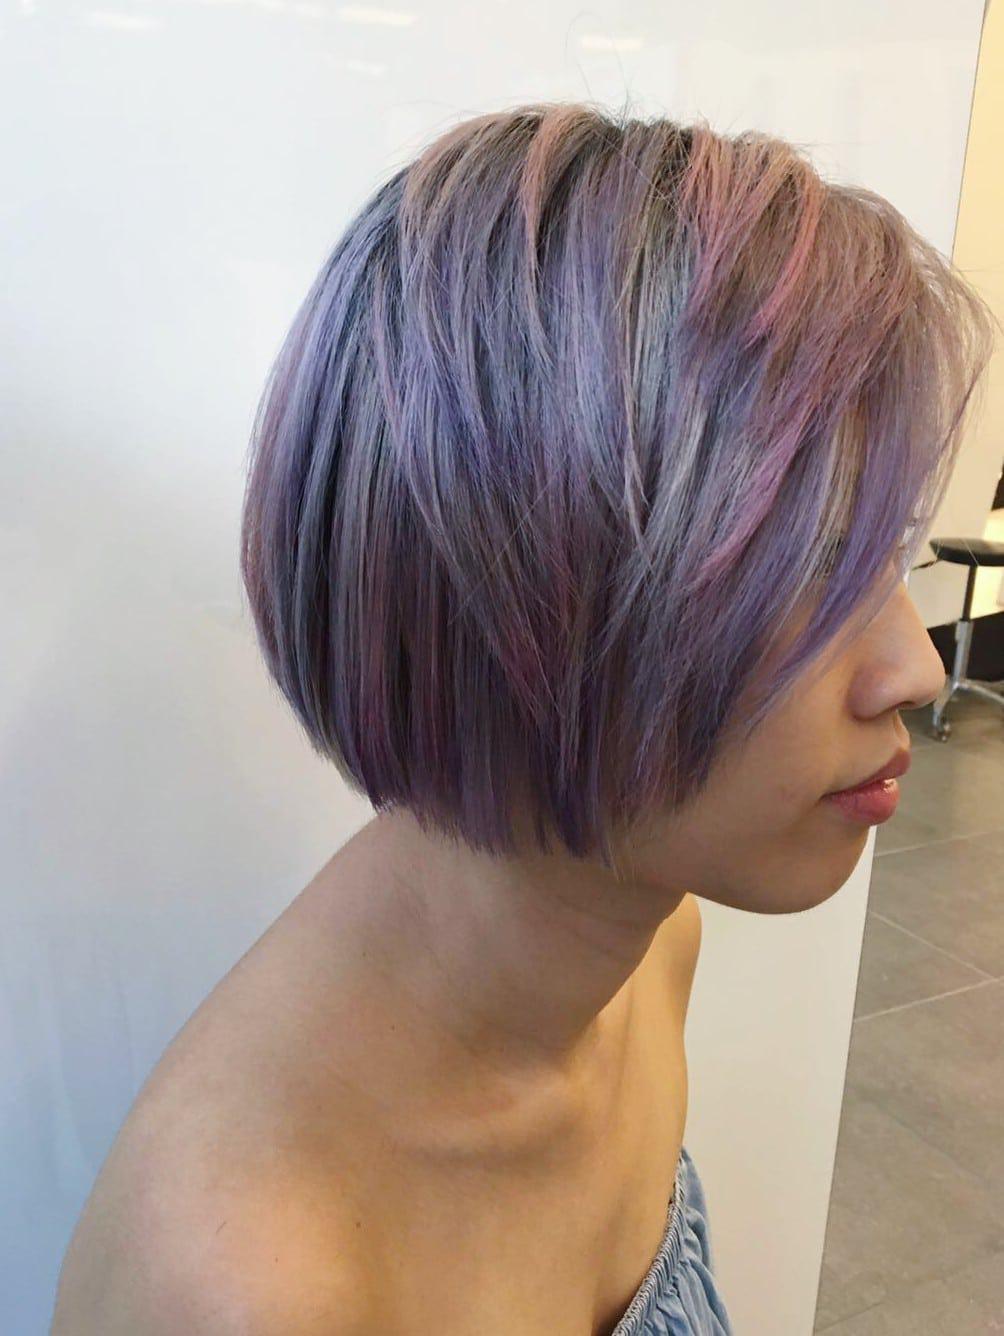 Hairloom Pink Rose Summer 2016 Hair Trend